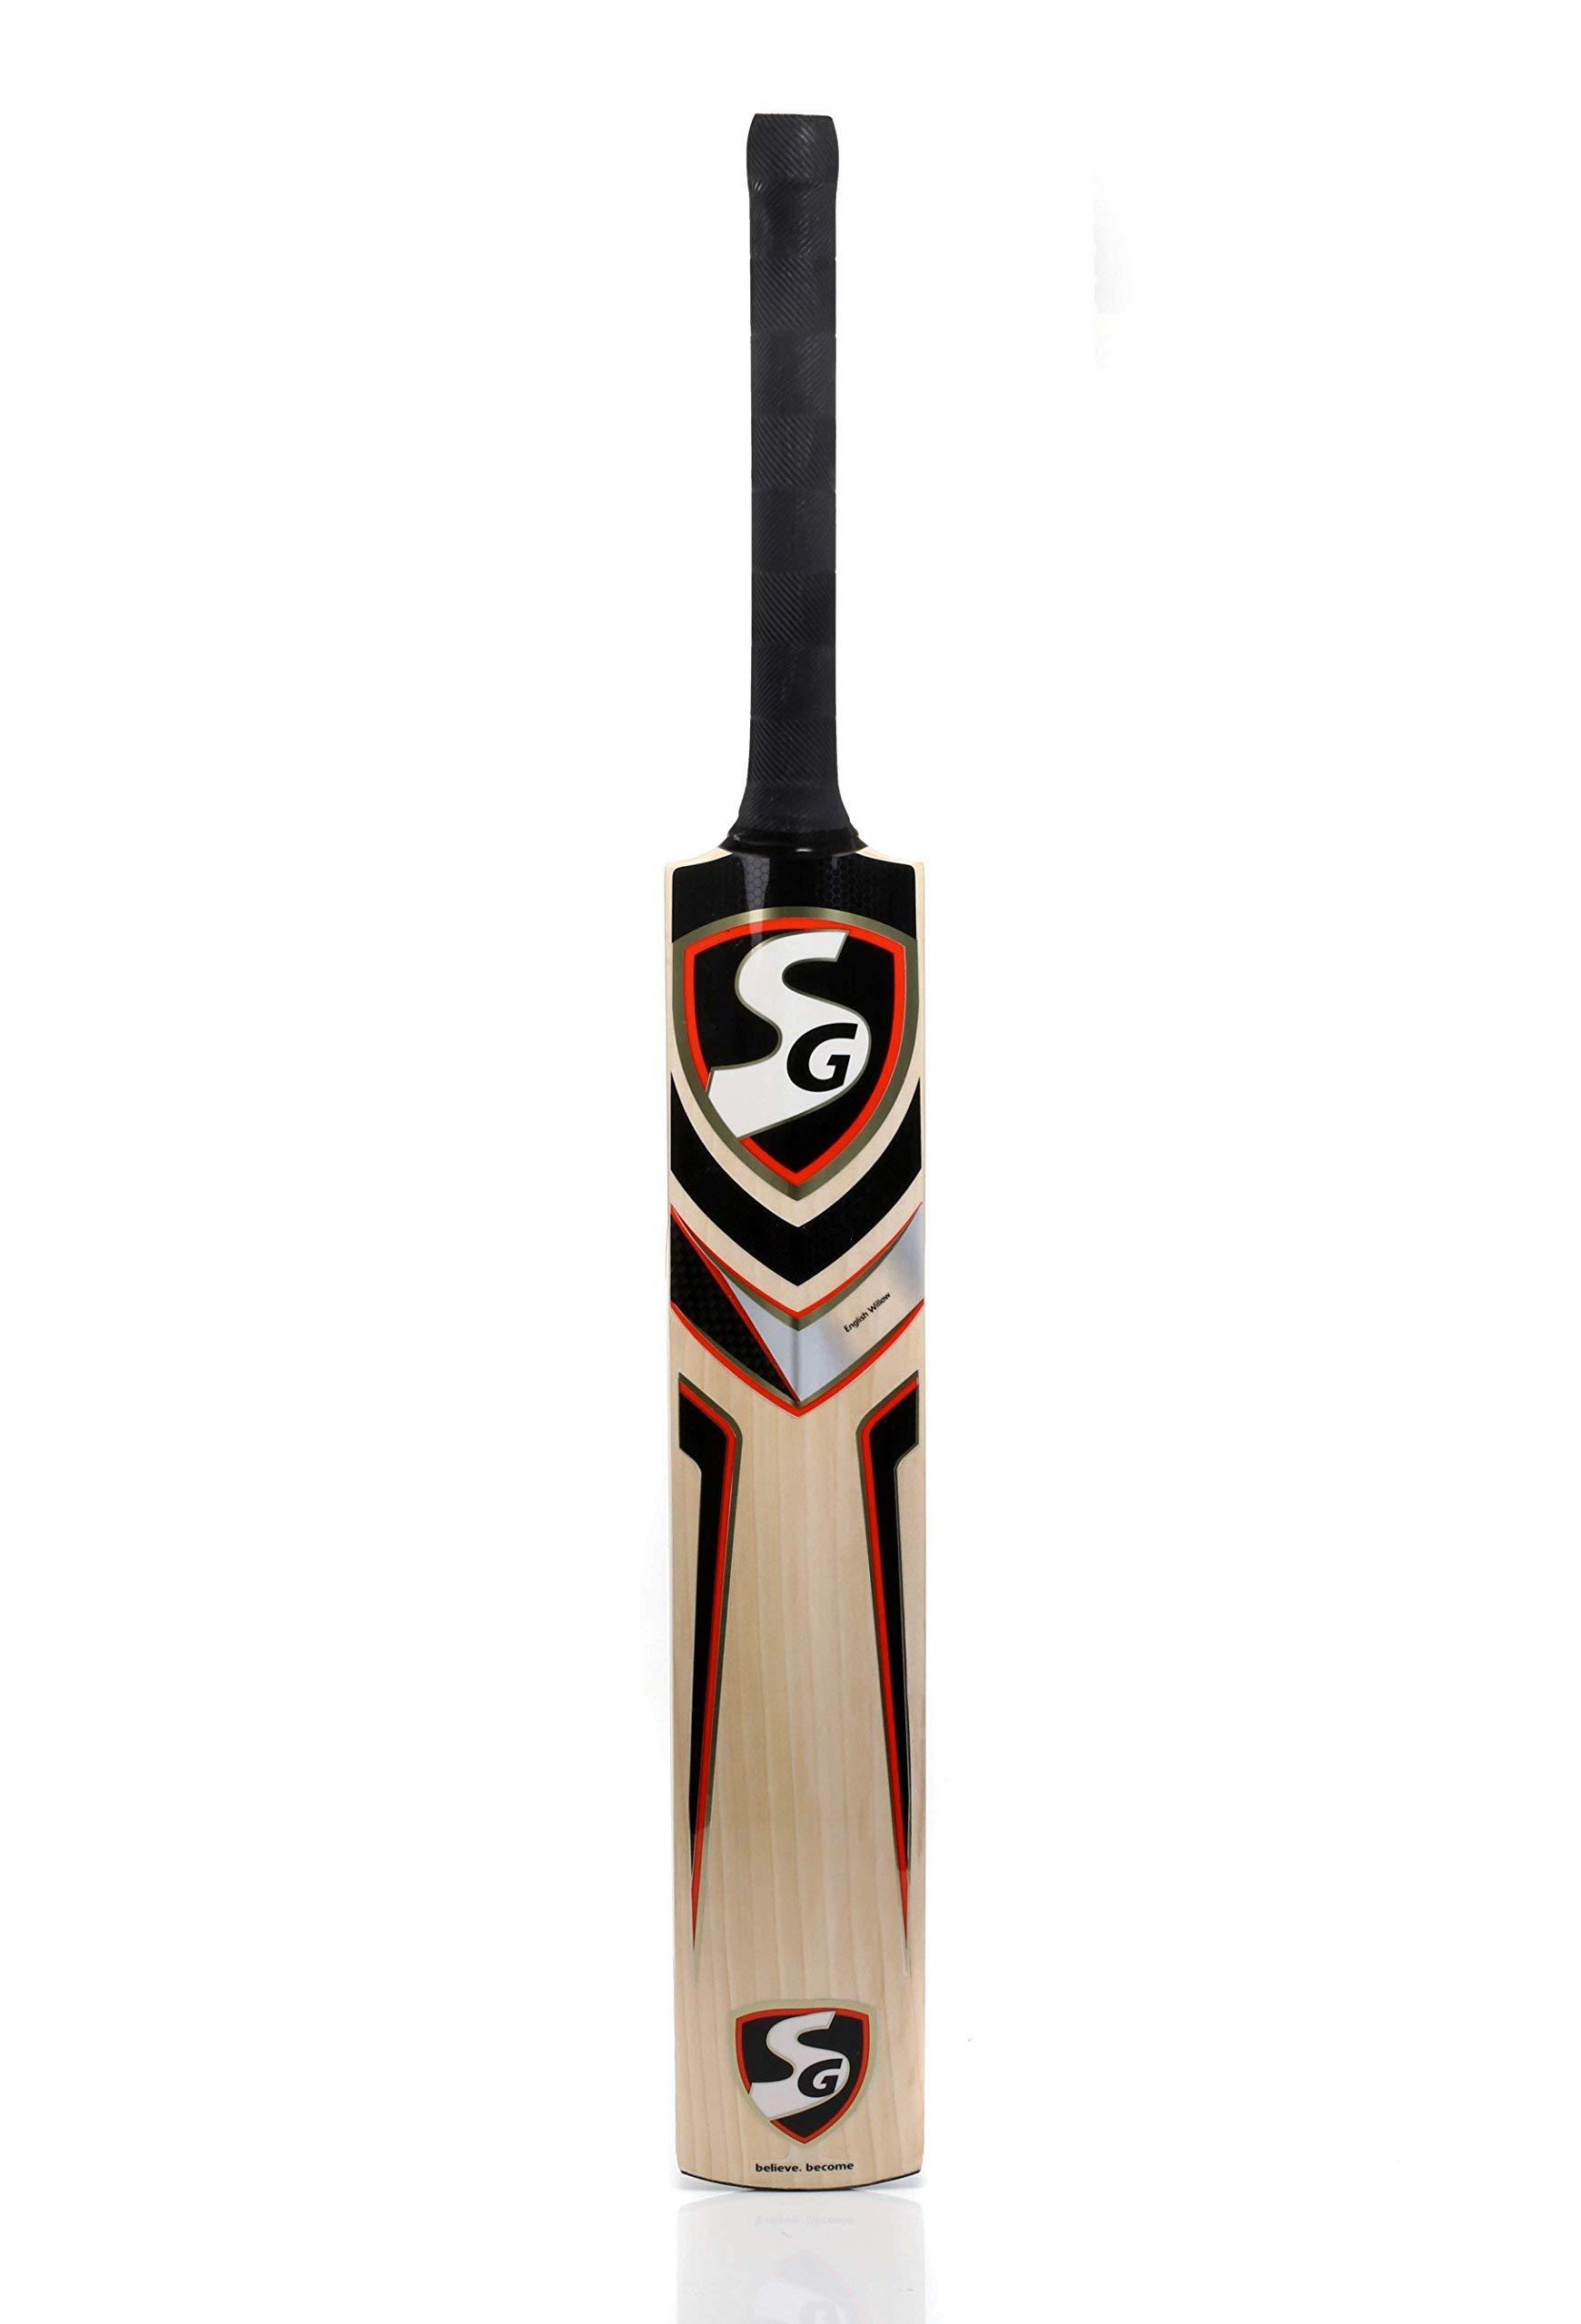 Whitedot sports SG Cobra Gold Kashmir Willow Cricket Bat Size 5